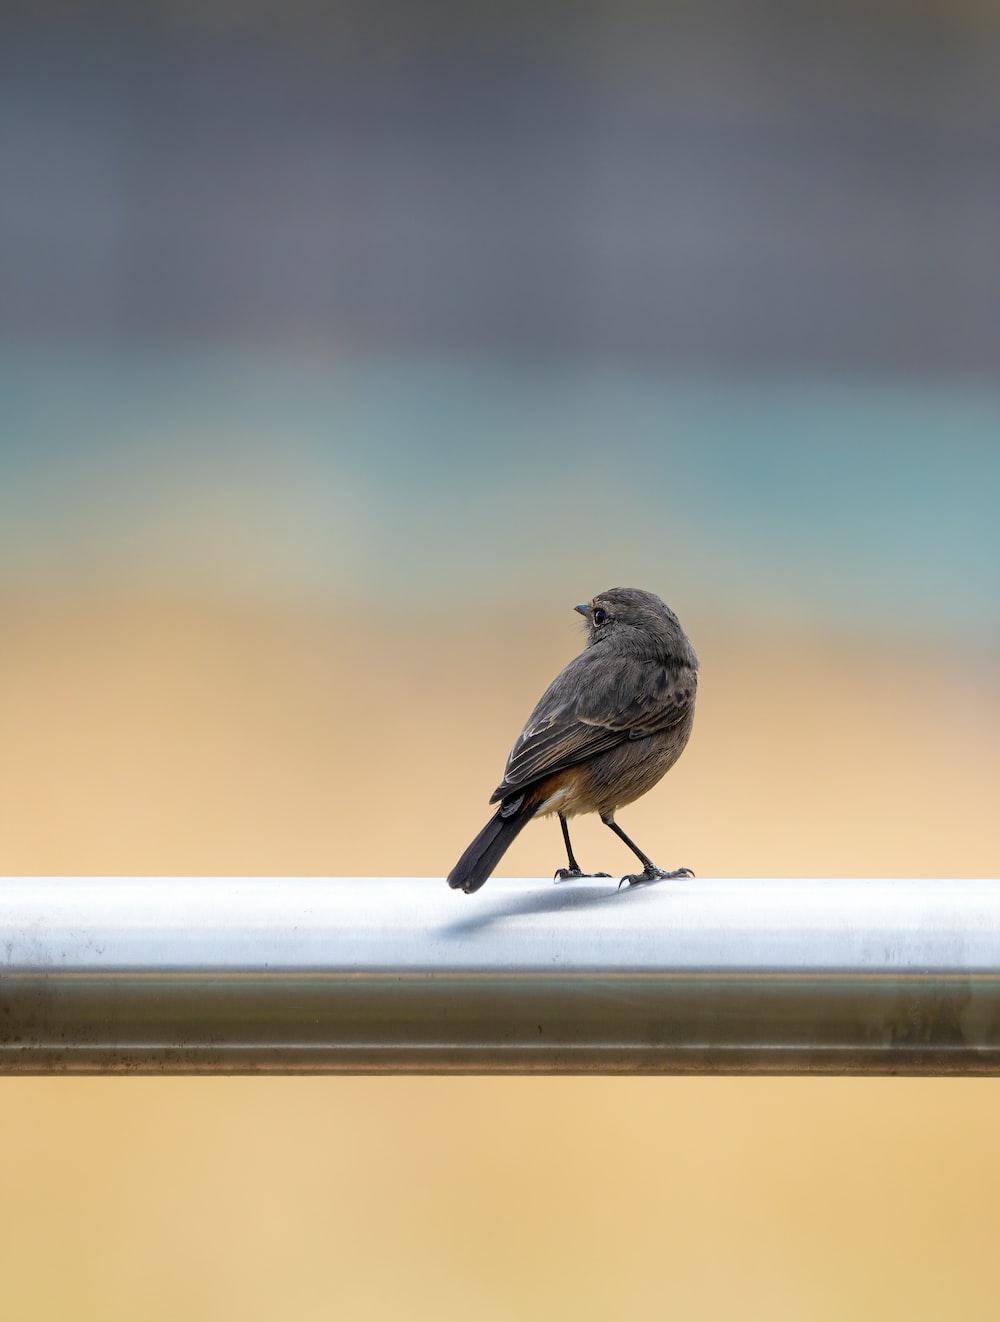 brown bird on white wooden fence